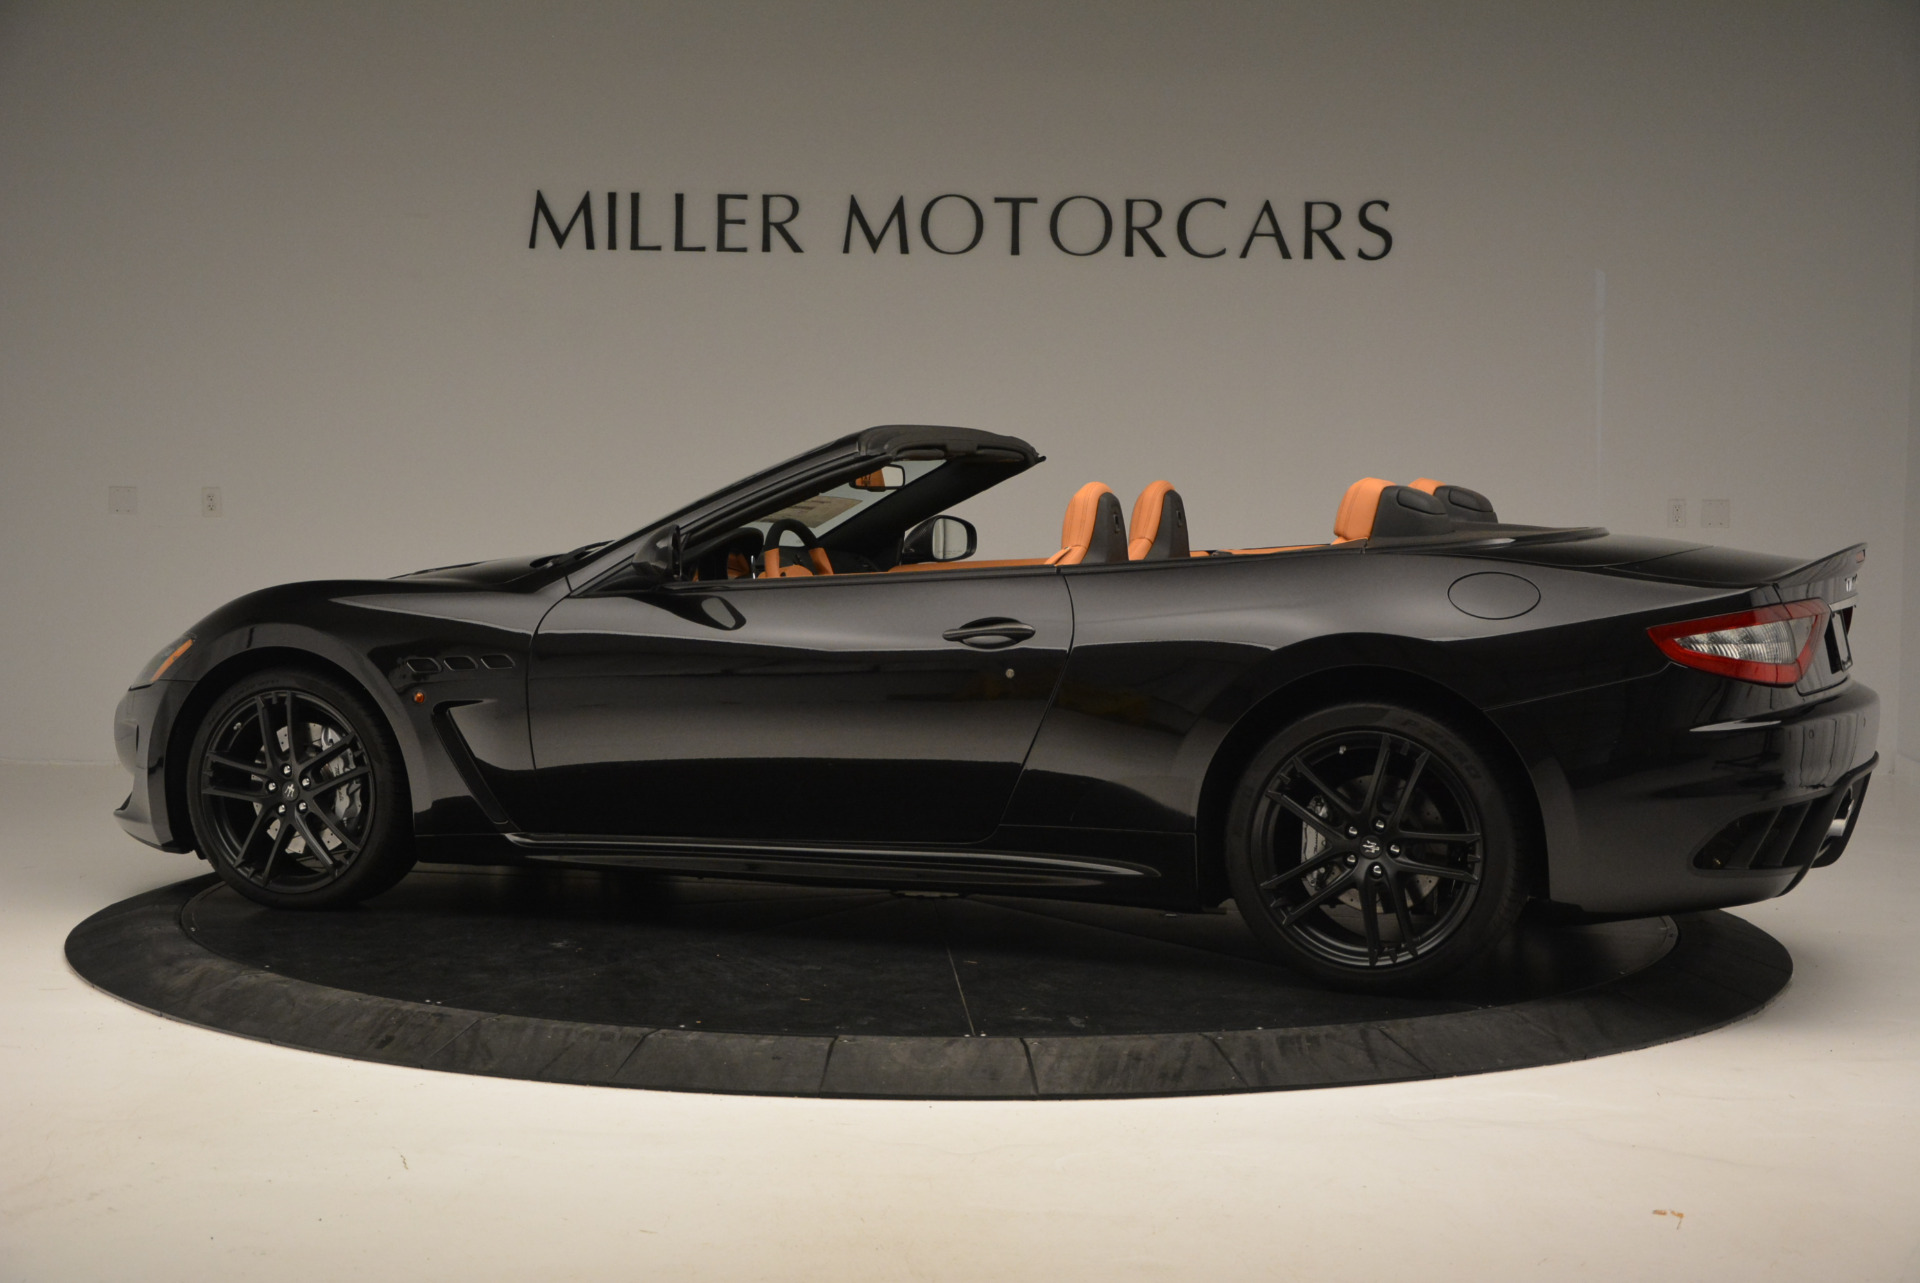 New 2017 Maserati GranTurismo MC CONVERTIBLE For Sale In Westport, CT 596_p4